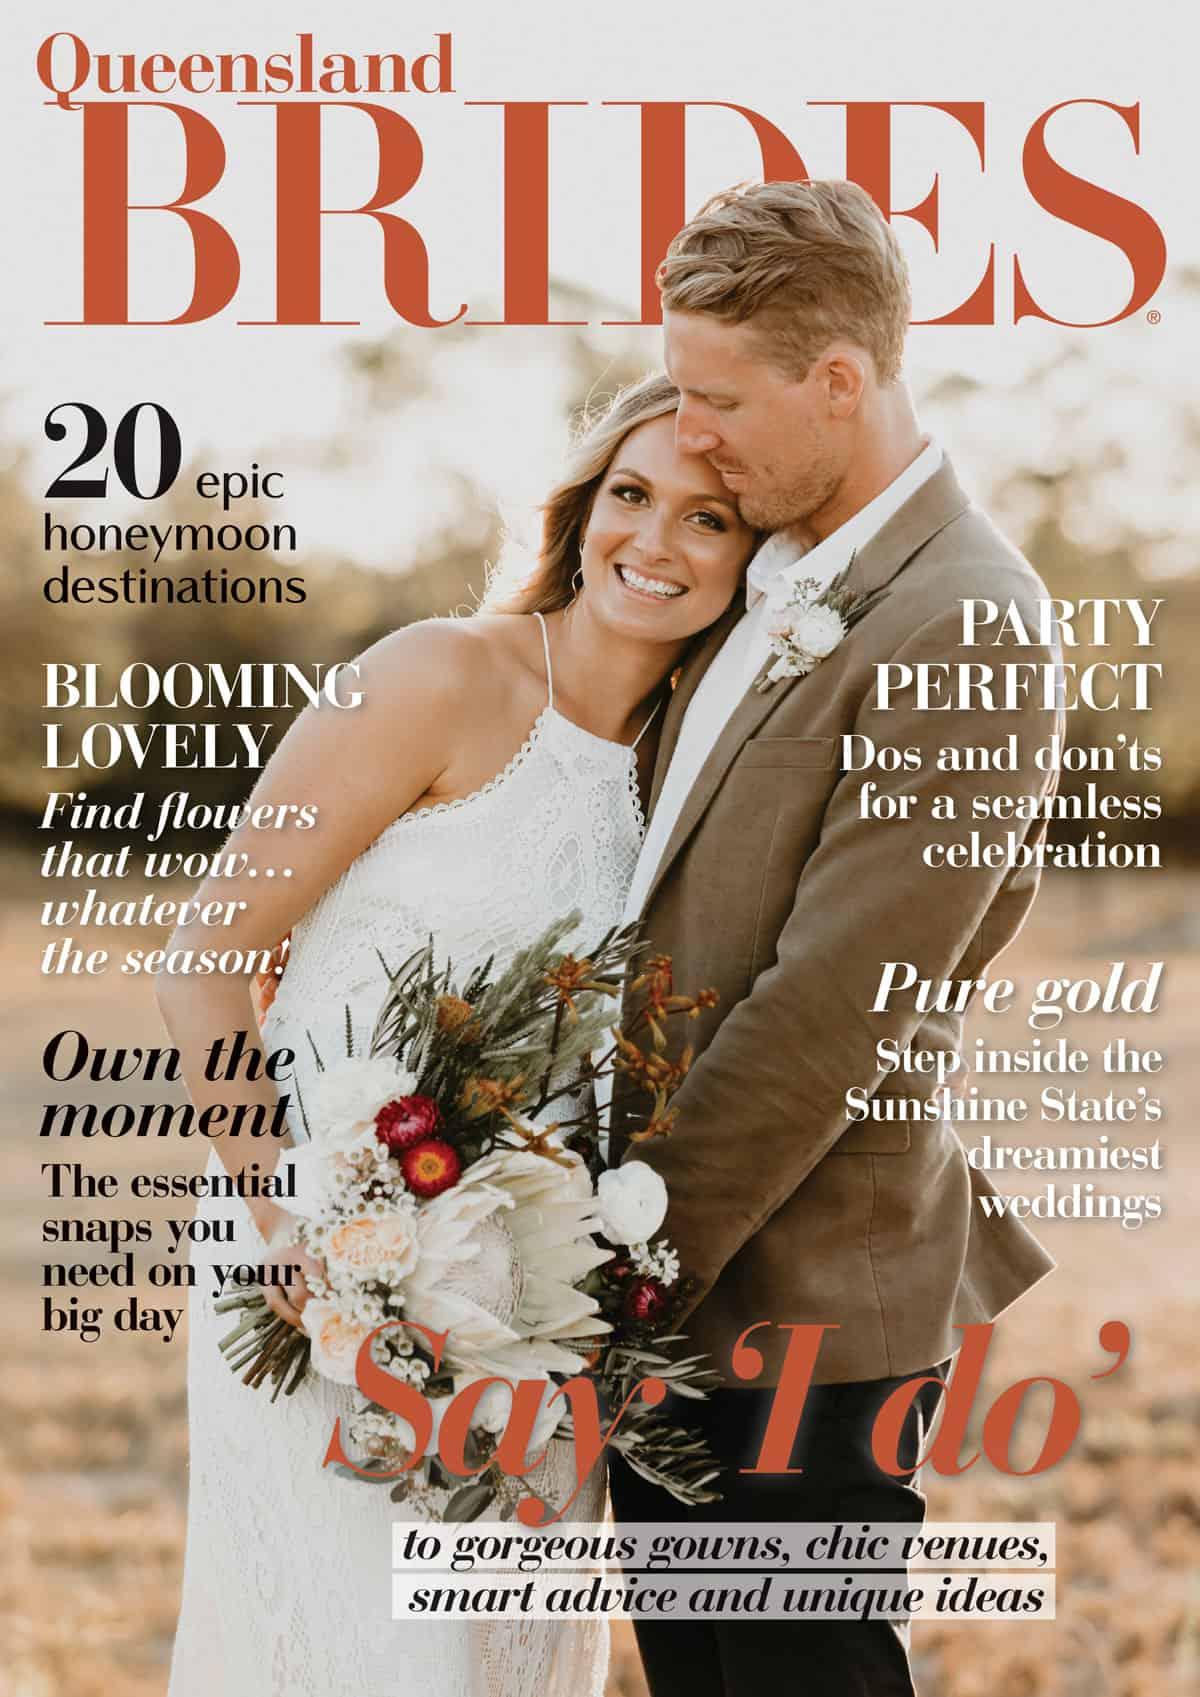 2020 edition of Queensland Brides magazine